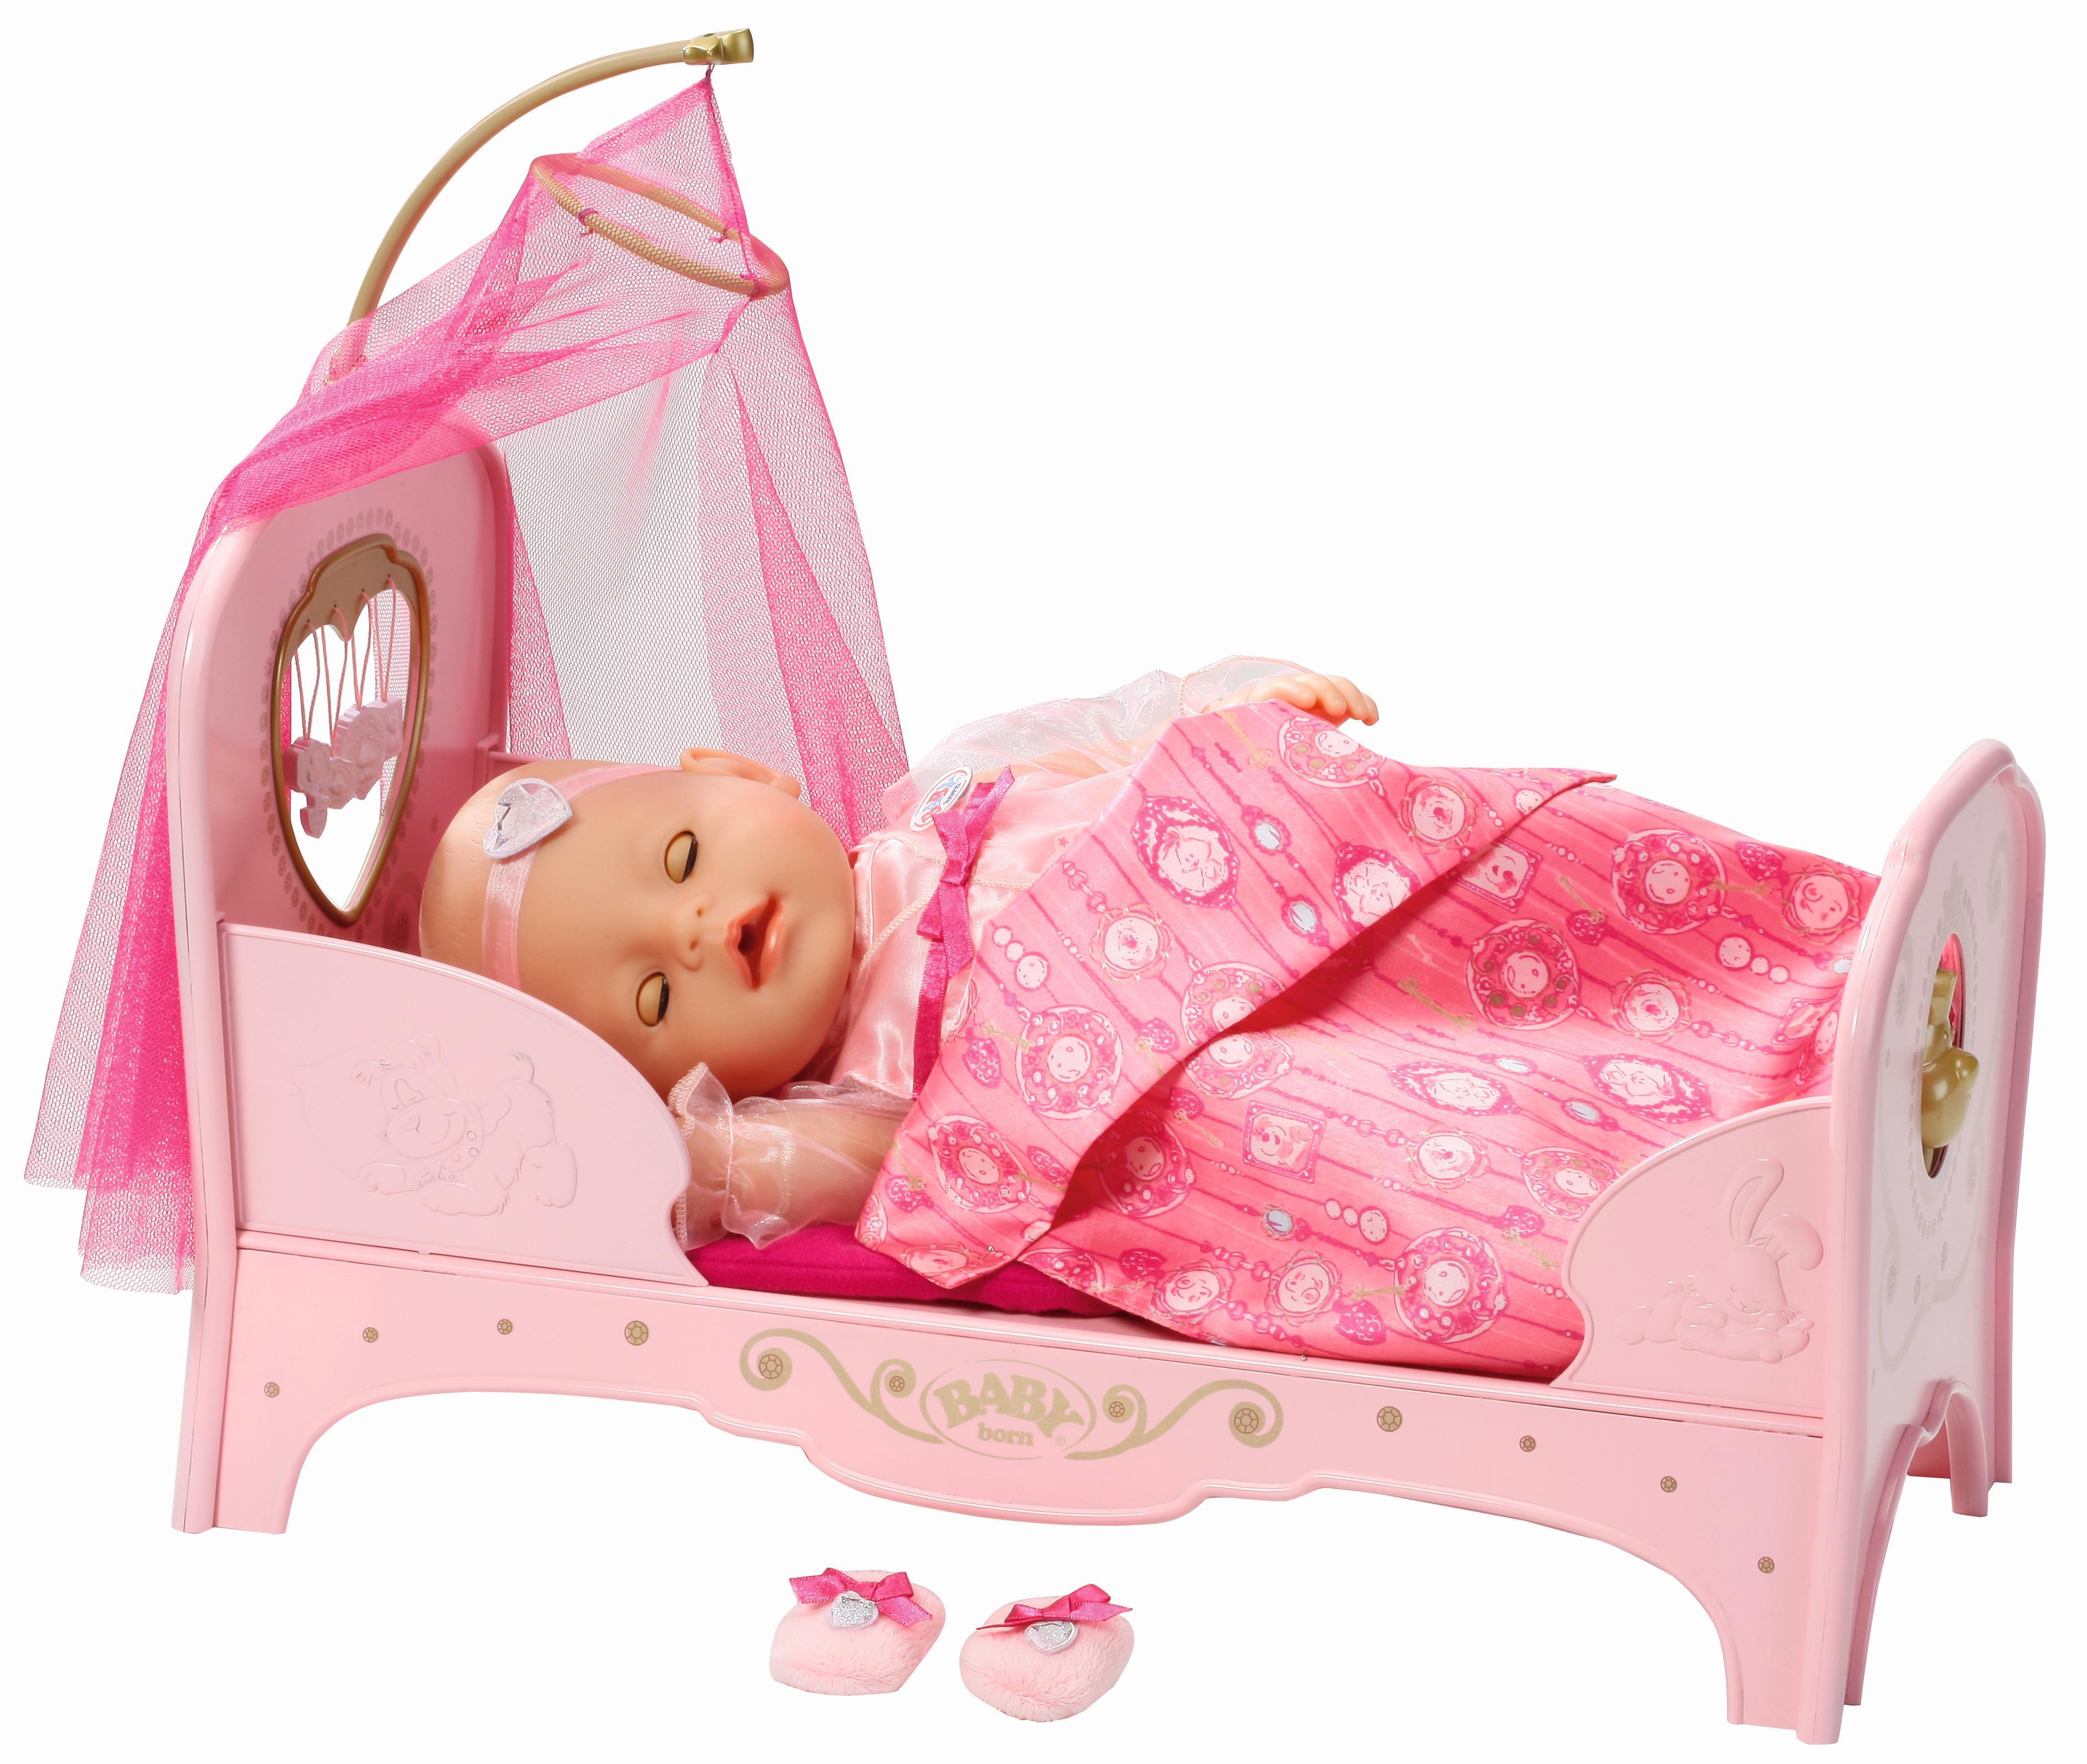 Baby born prinzessin bett interaktiv